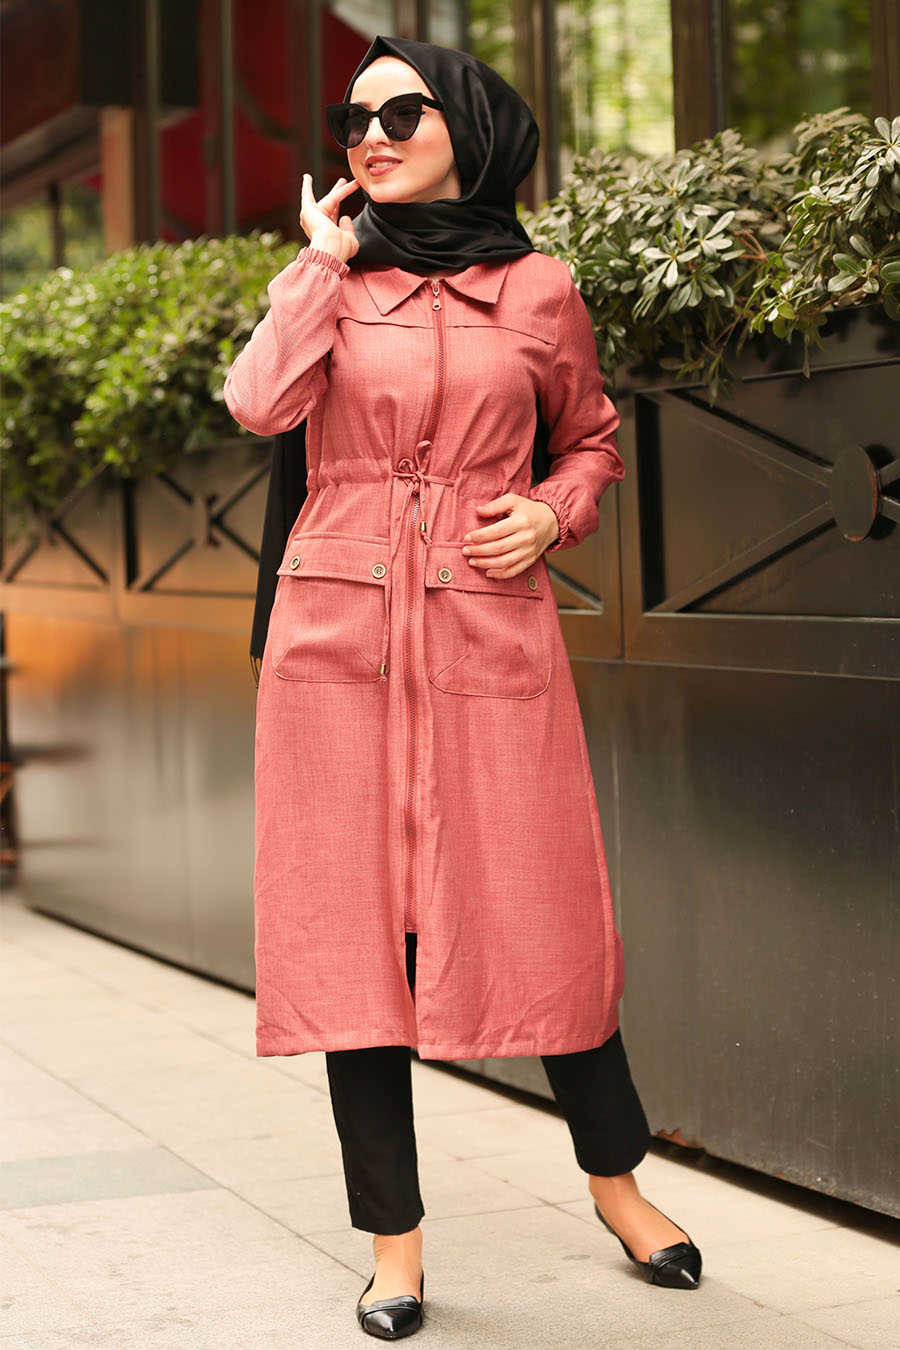 Neva Style - Terra Cotta Hijab Daily Dress 56770KRMT